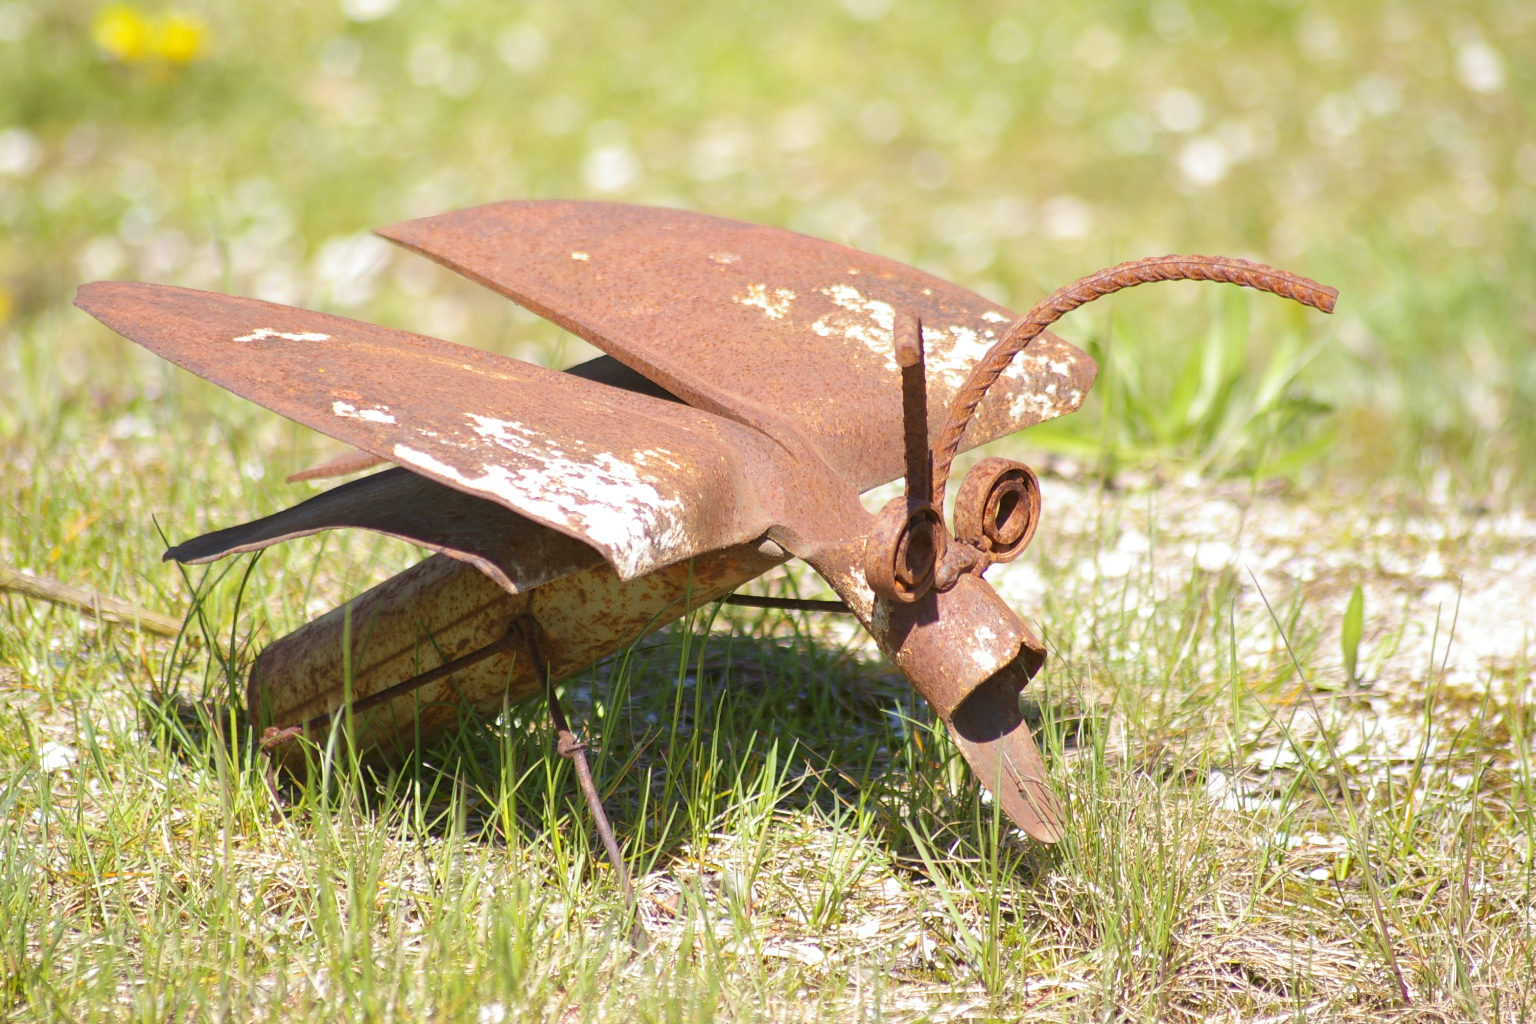 Alte Schaufel als Käfer